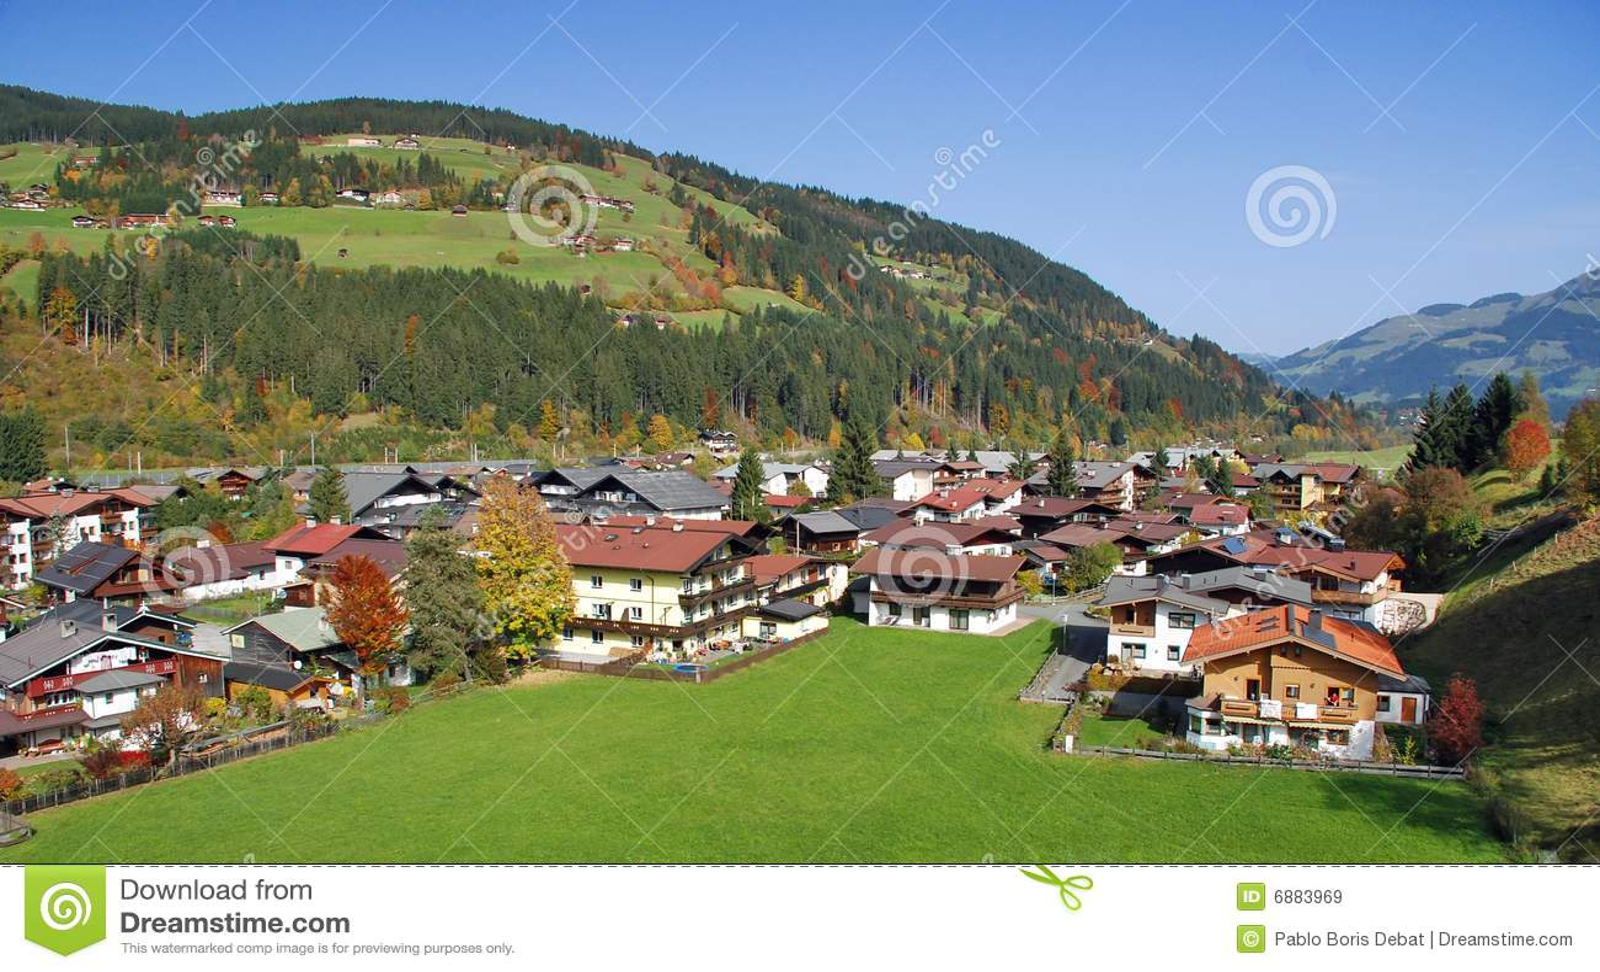 Casas em Kirchberg em Tirol - Kitzbuhel Áustria